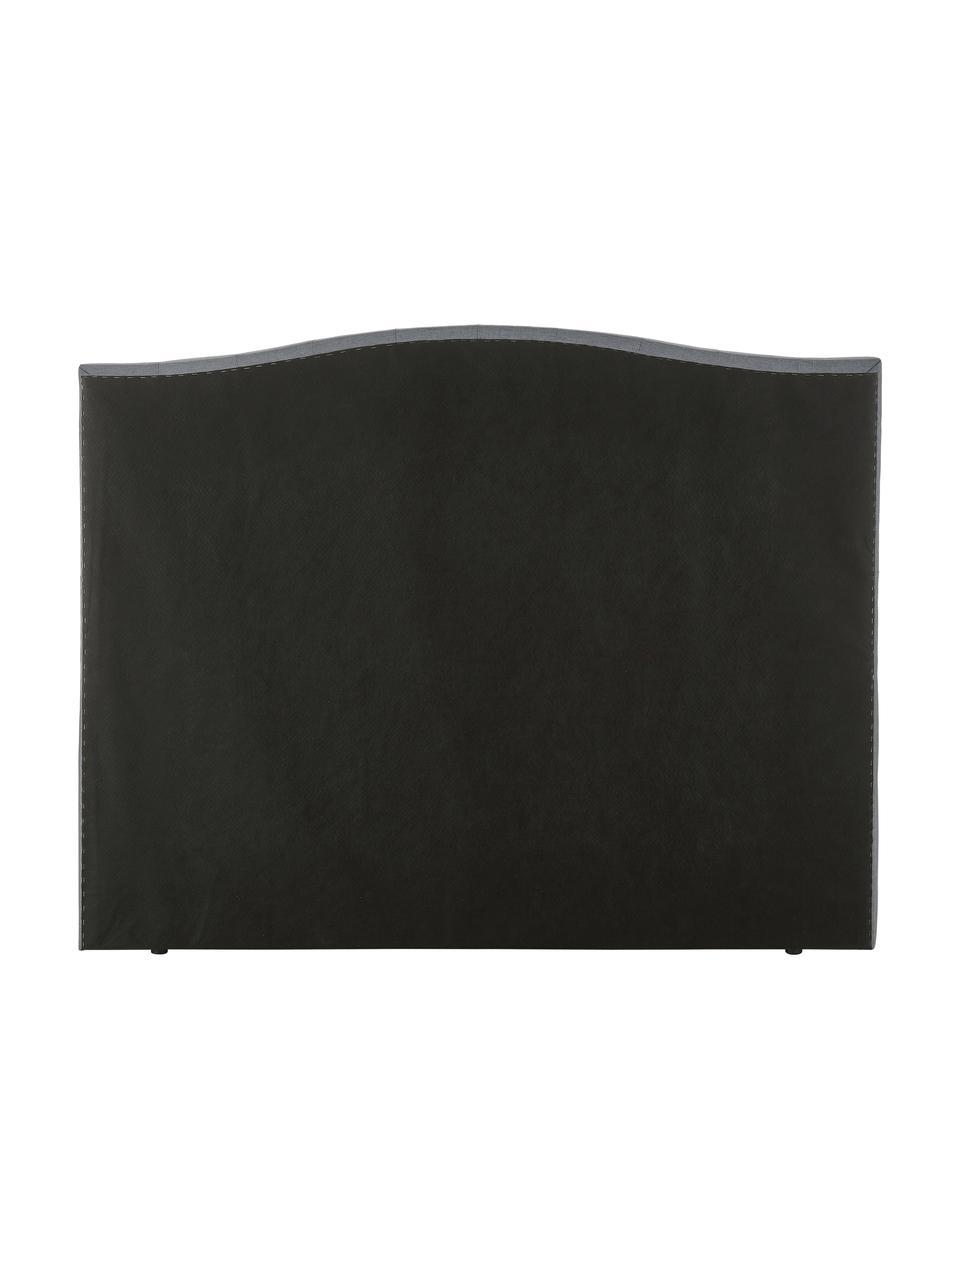 Premium Boxspringbett Royal in Grau, Matratze: 5-Zonen-Taschenfederkern, Füße: Massives Birkenholz, lack, Webstoff Grau, 200 x 200 cm